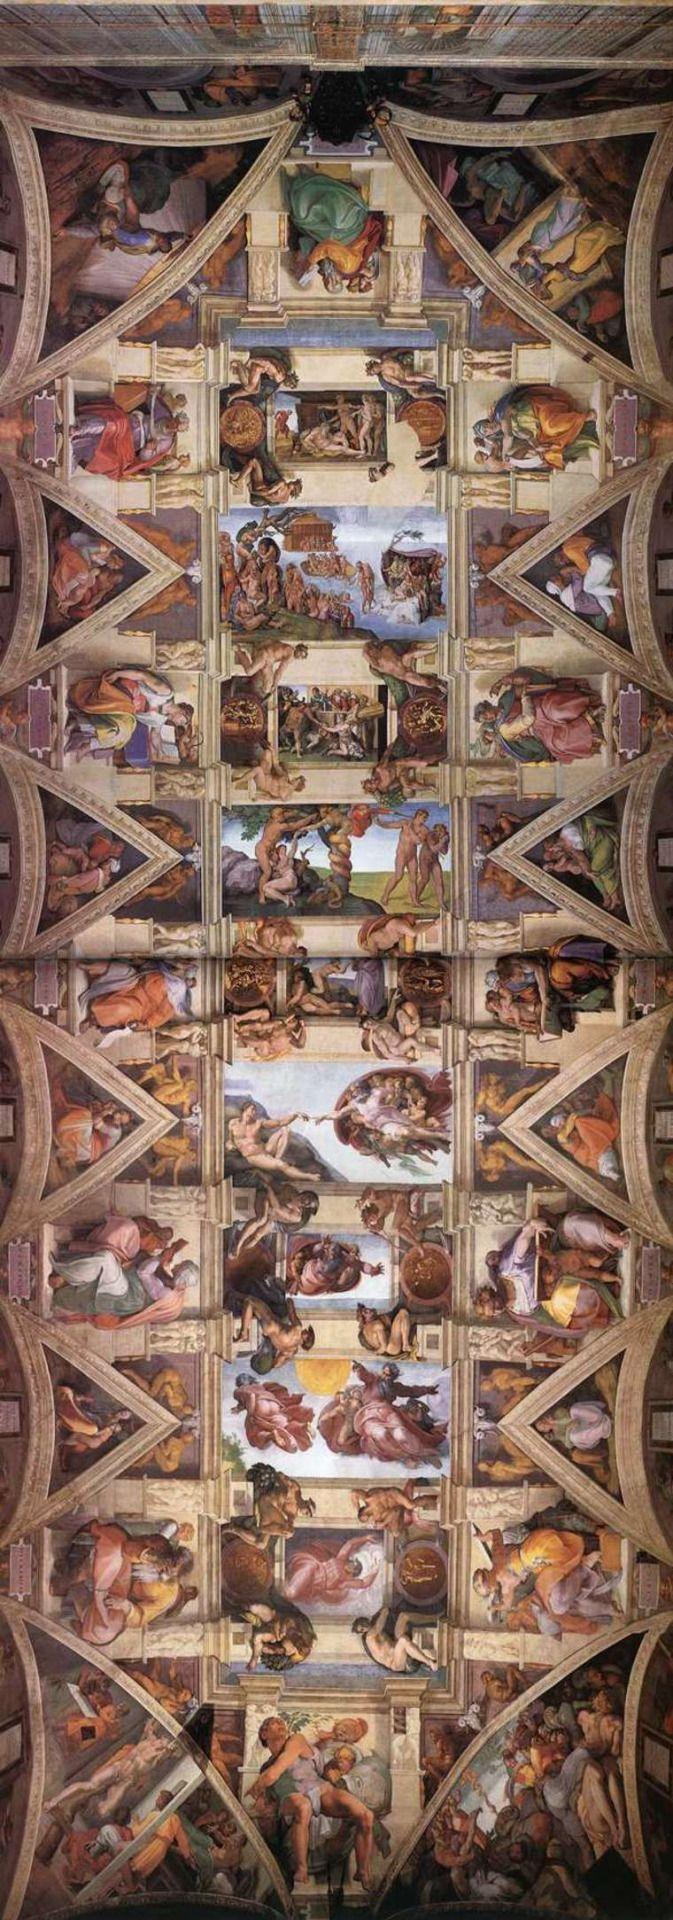 "michelangelogallery: ""Sistine Chapel Ceiling, Vatican """